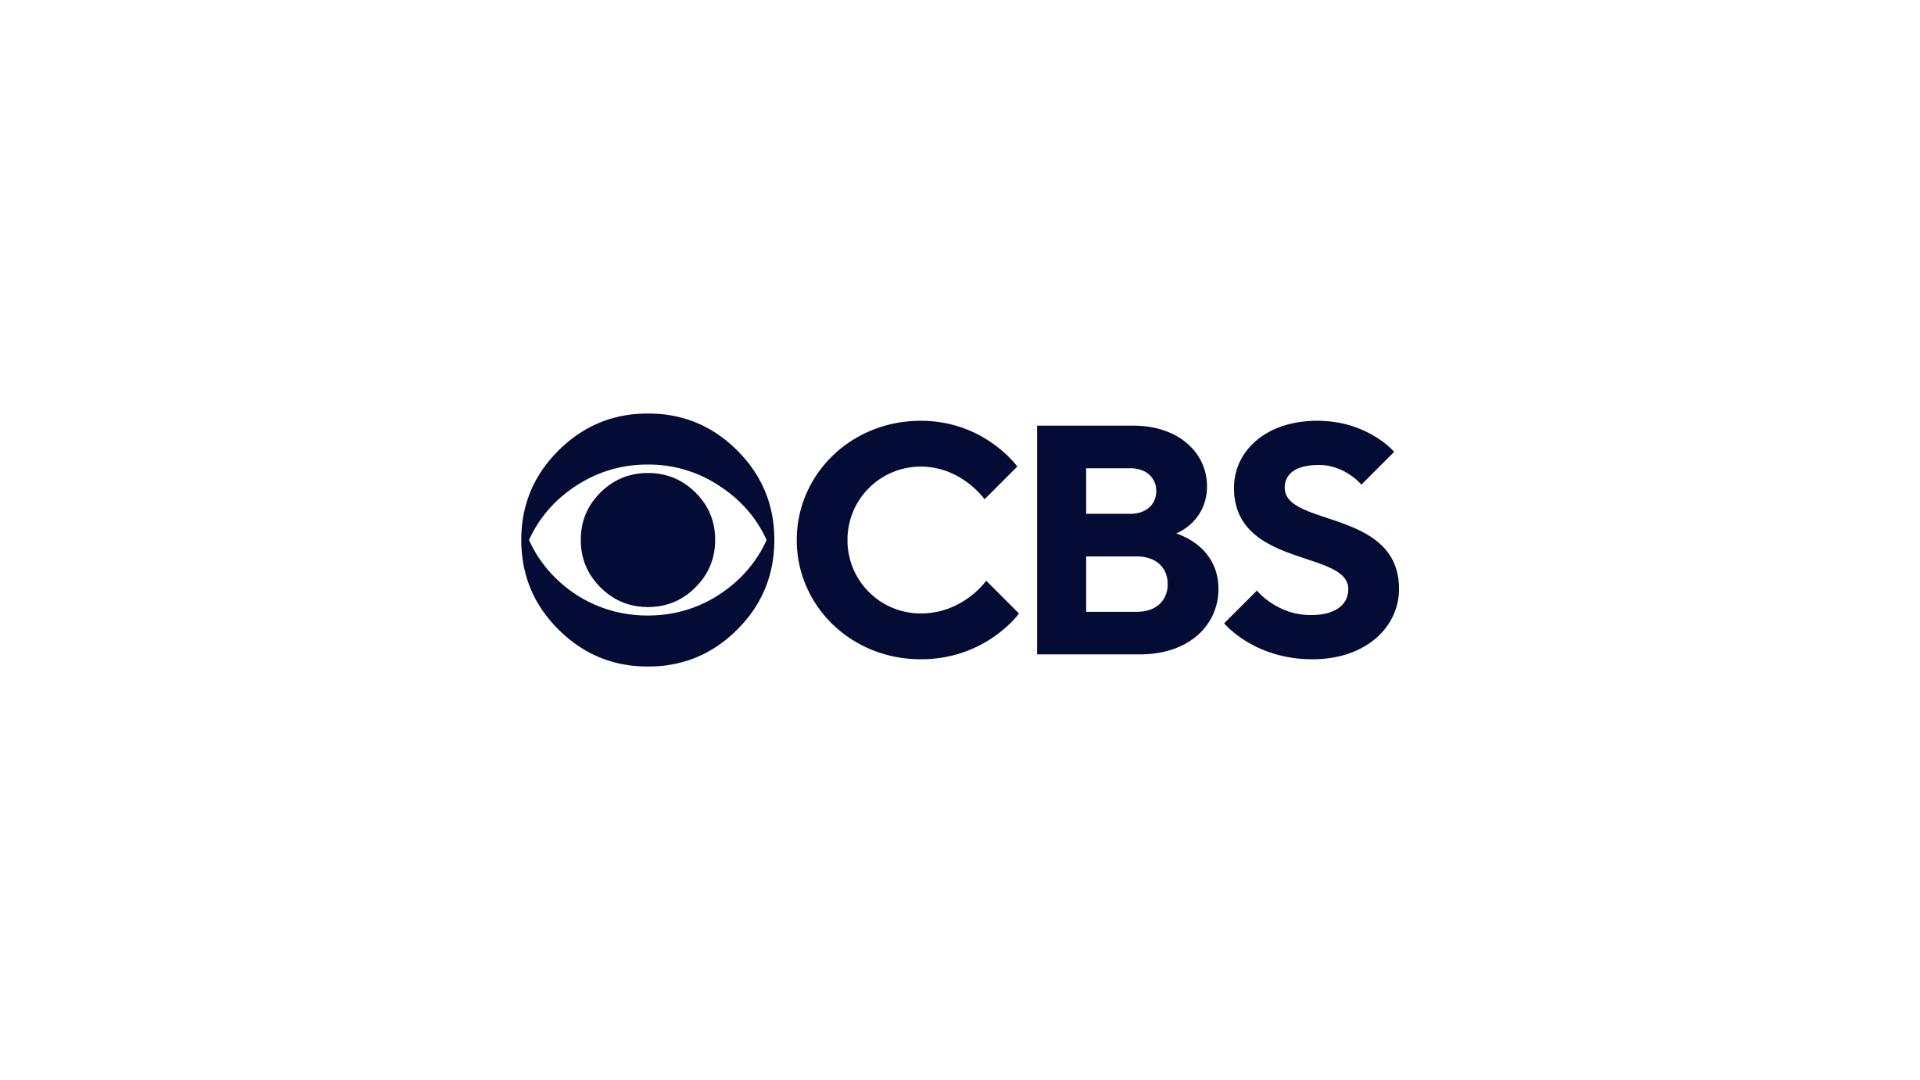 CBS Logo in Navy on White Background